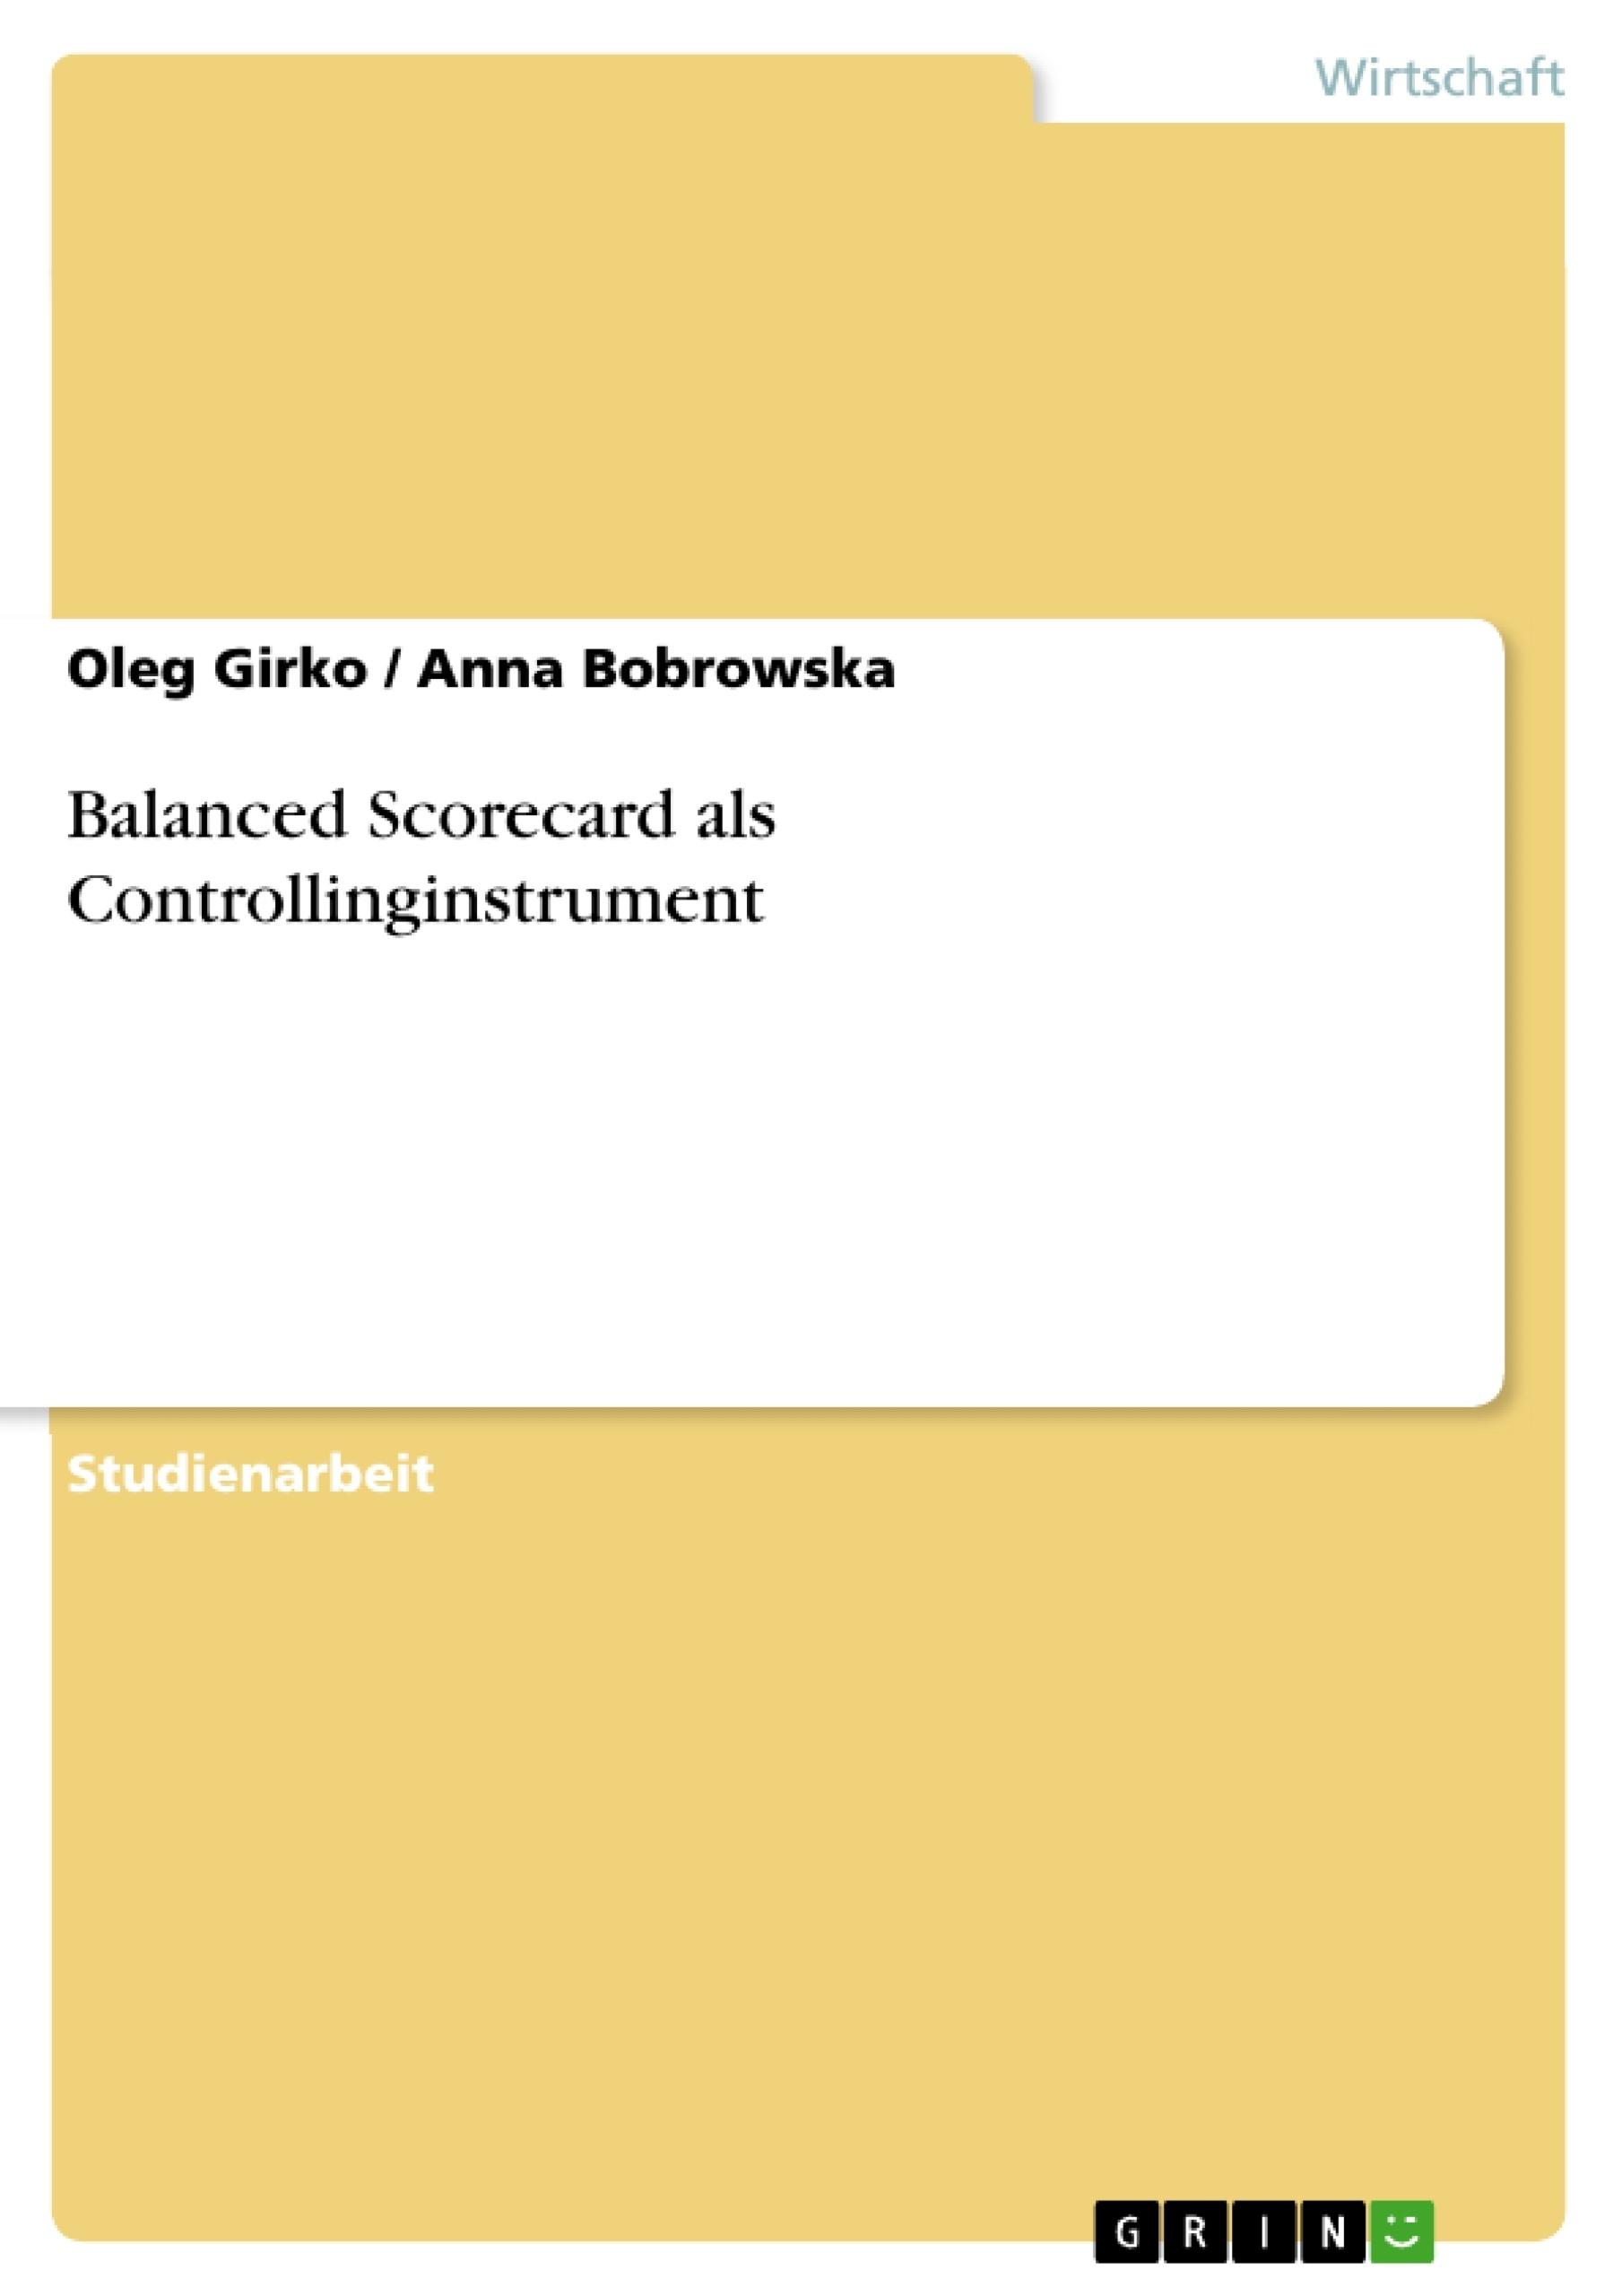 Titel: Balanced Scorecard als Controllinginstrument